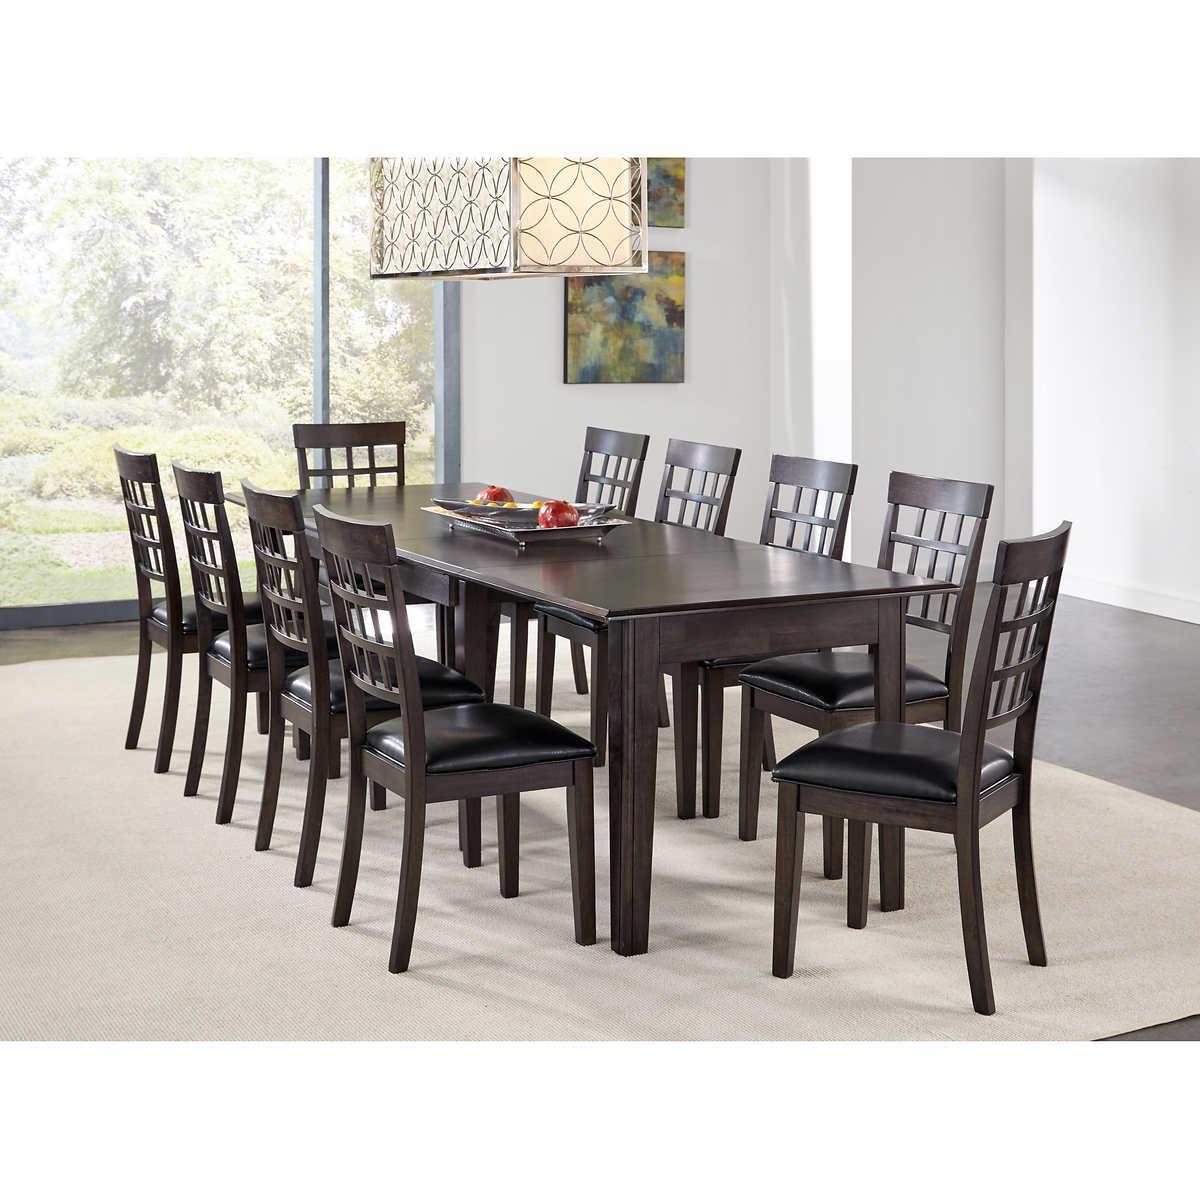 dining kitchen furniture costco bainbridge ii 11 piece dining set